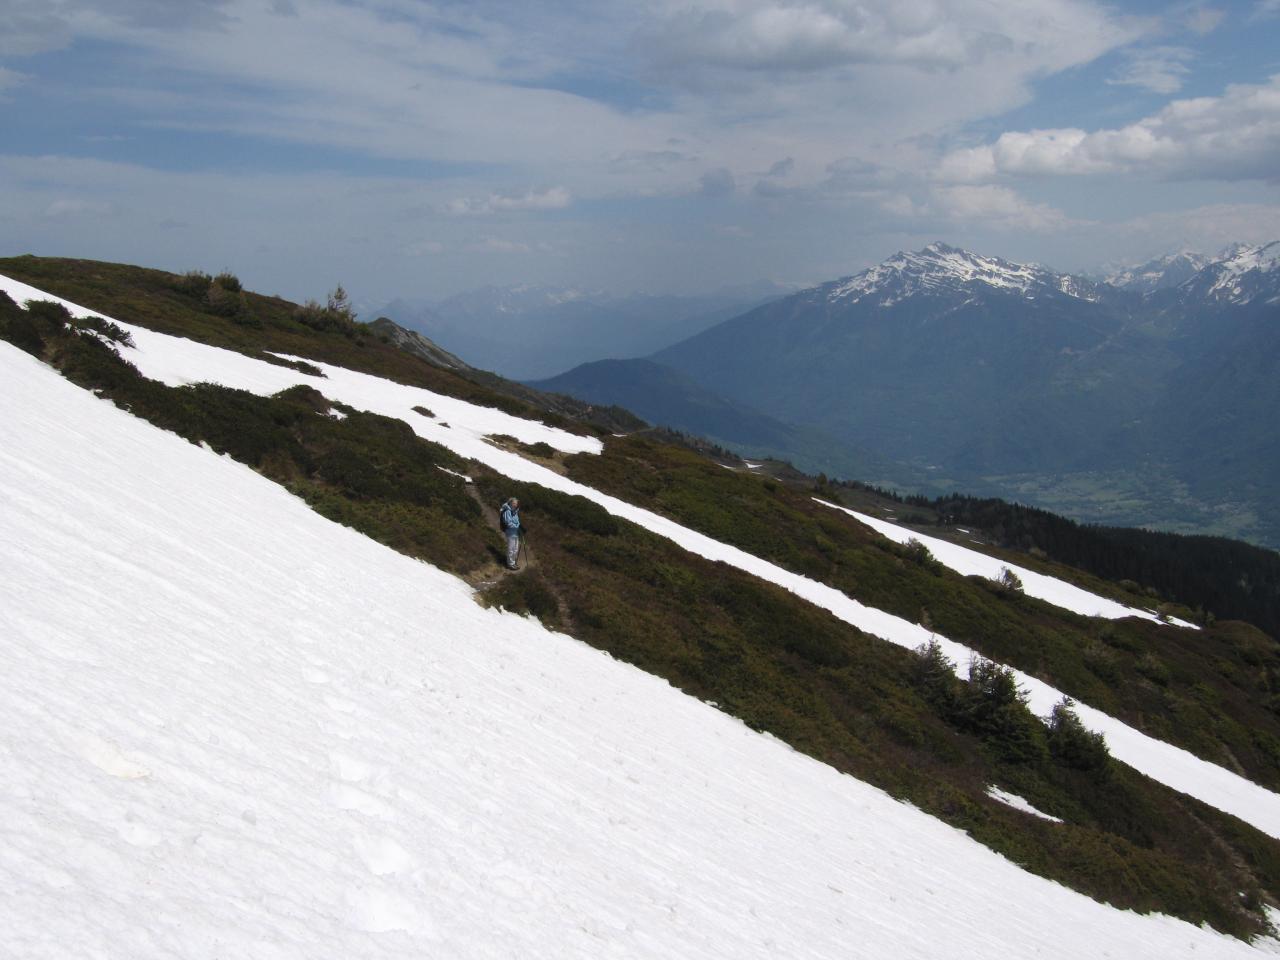 Simon en montagne 001